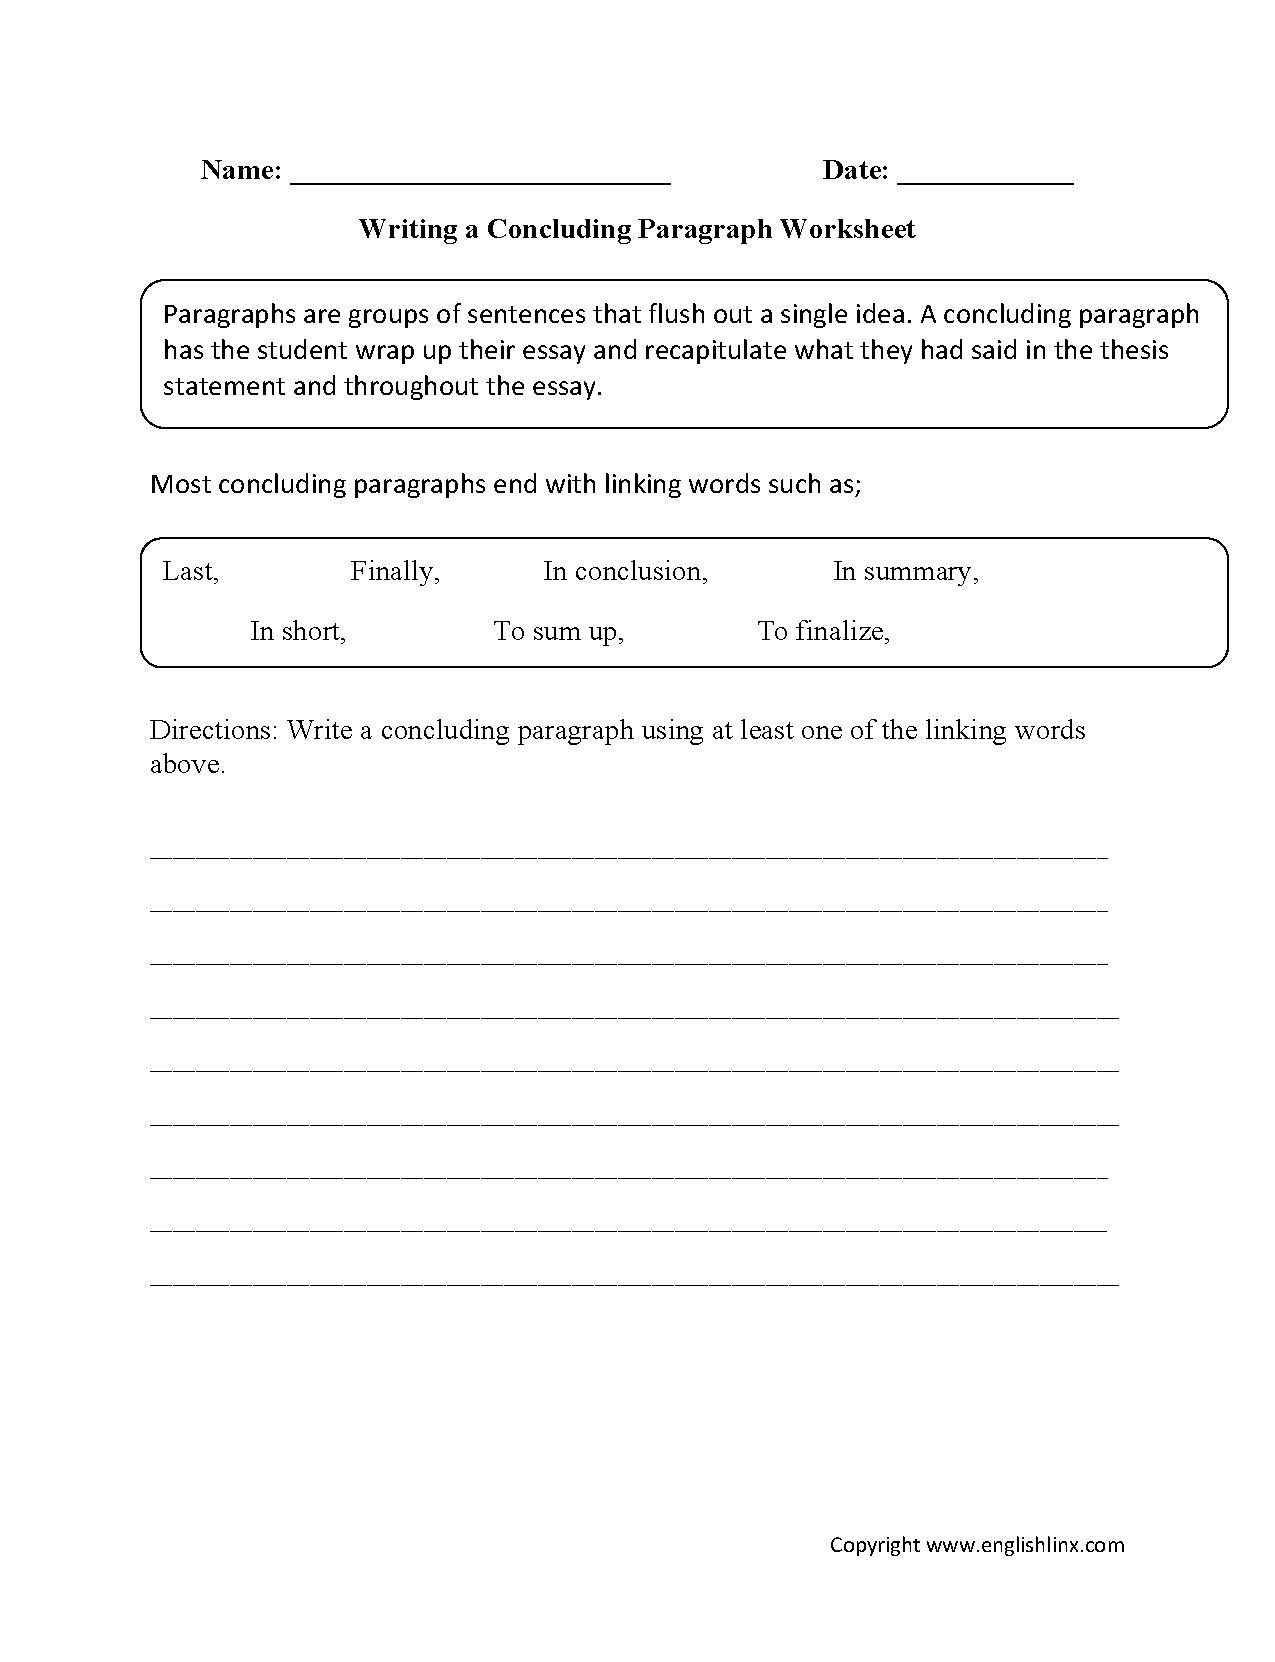 Paragraph Tracing Worksheets